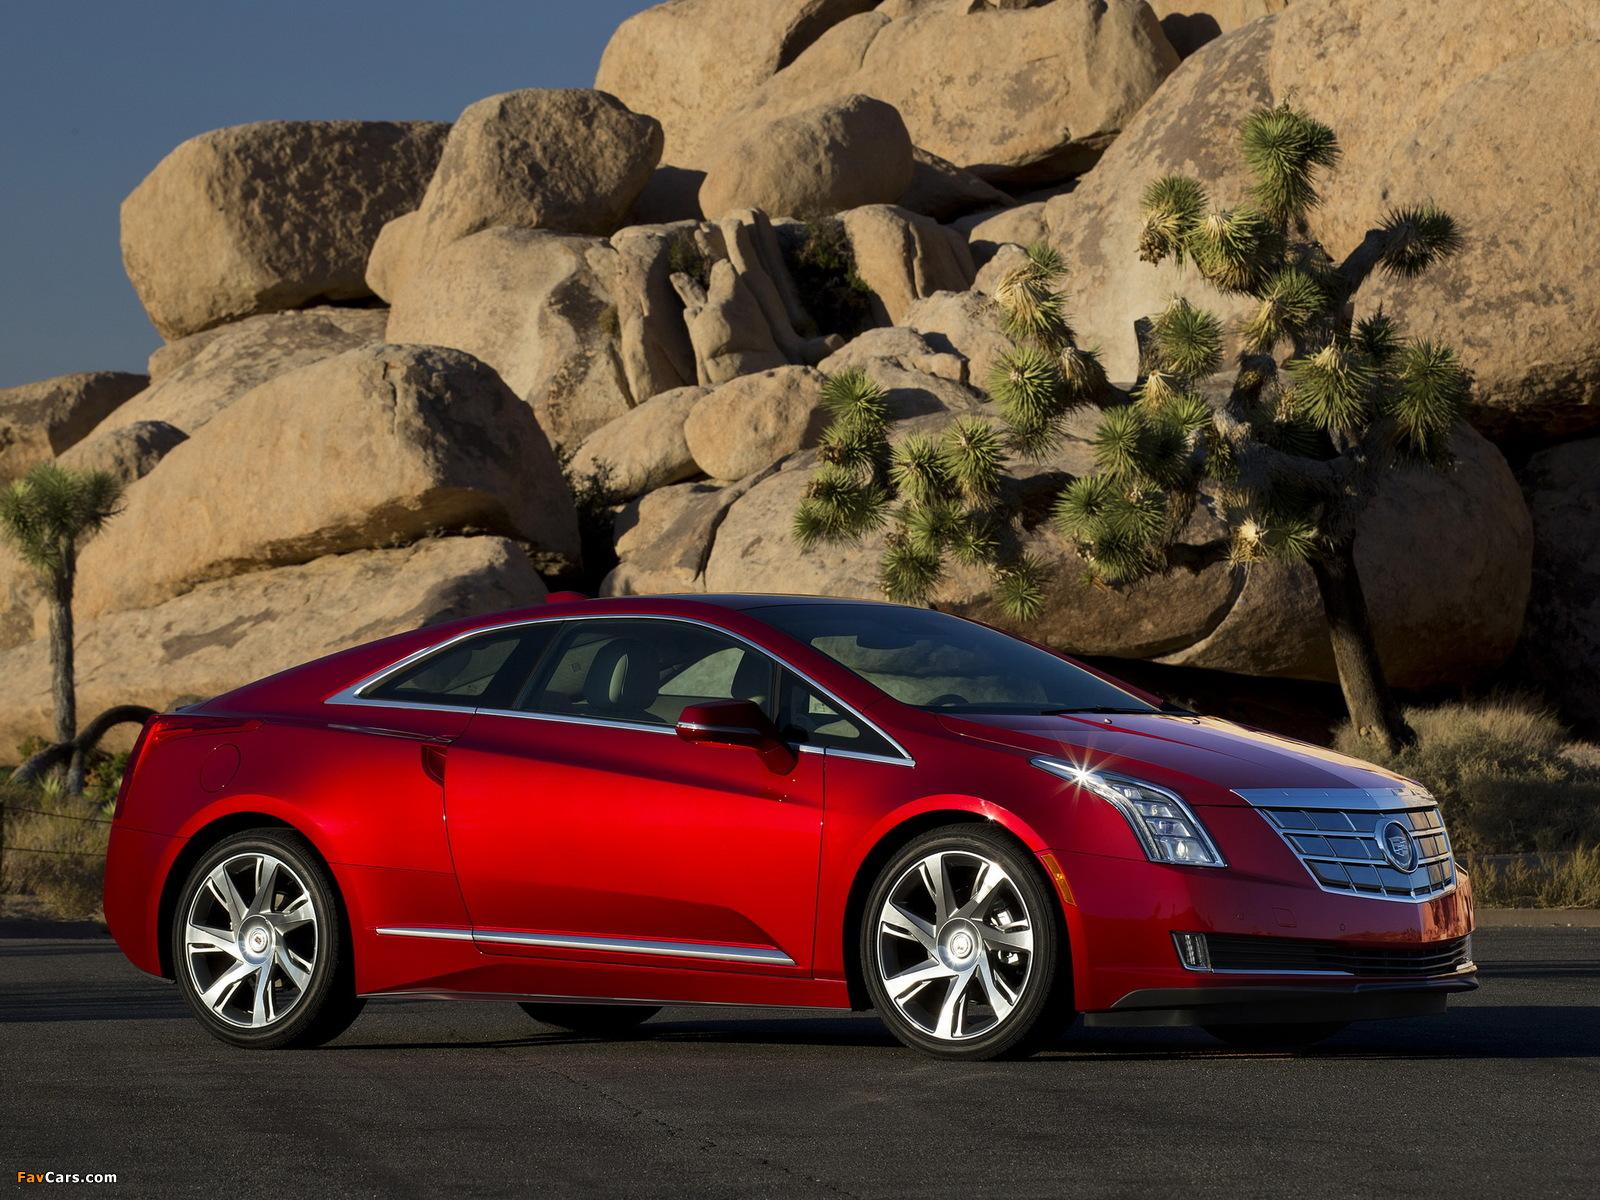 Cadillac ELR 2014 images (1600 x 1200)